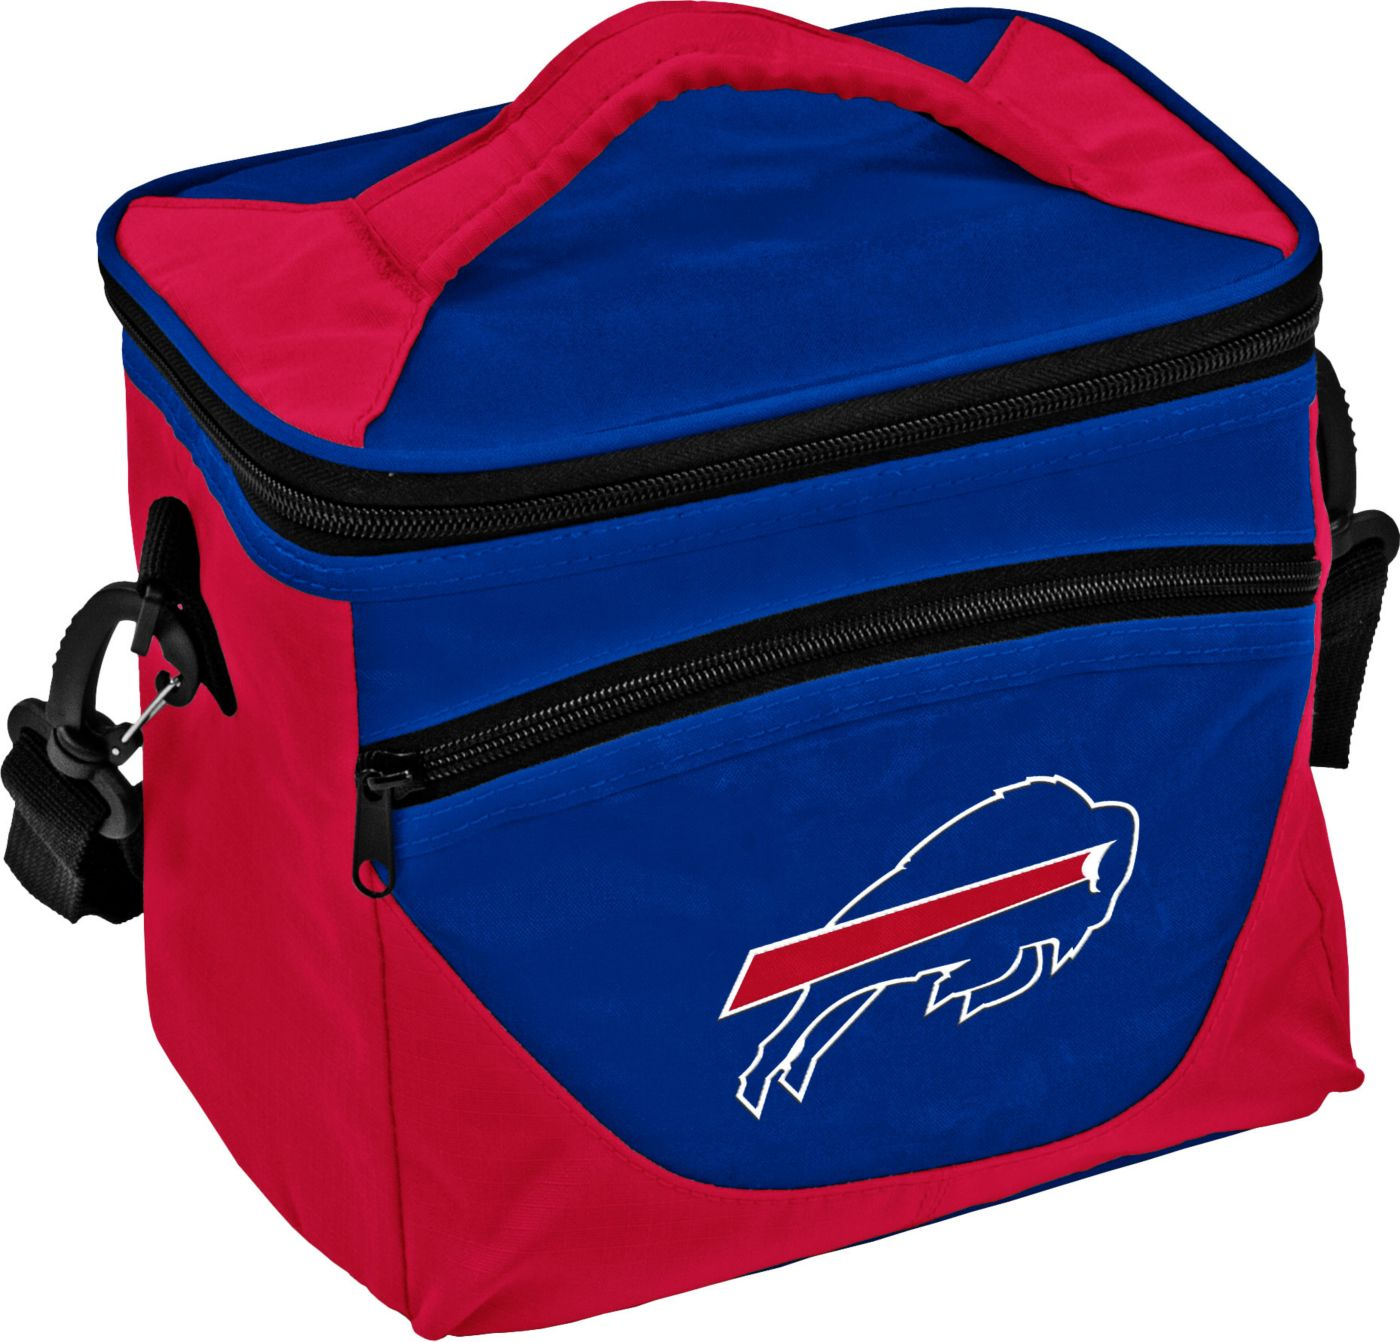 Buffalo Bills Halftime Lunch Cooler